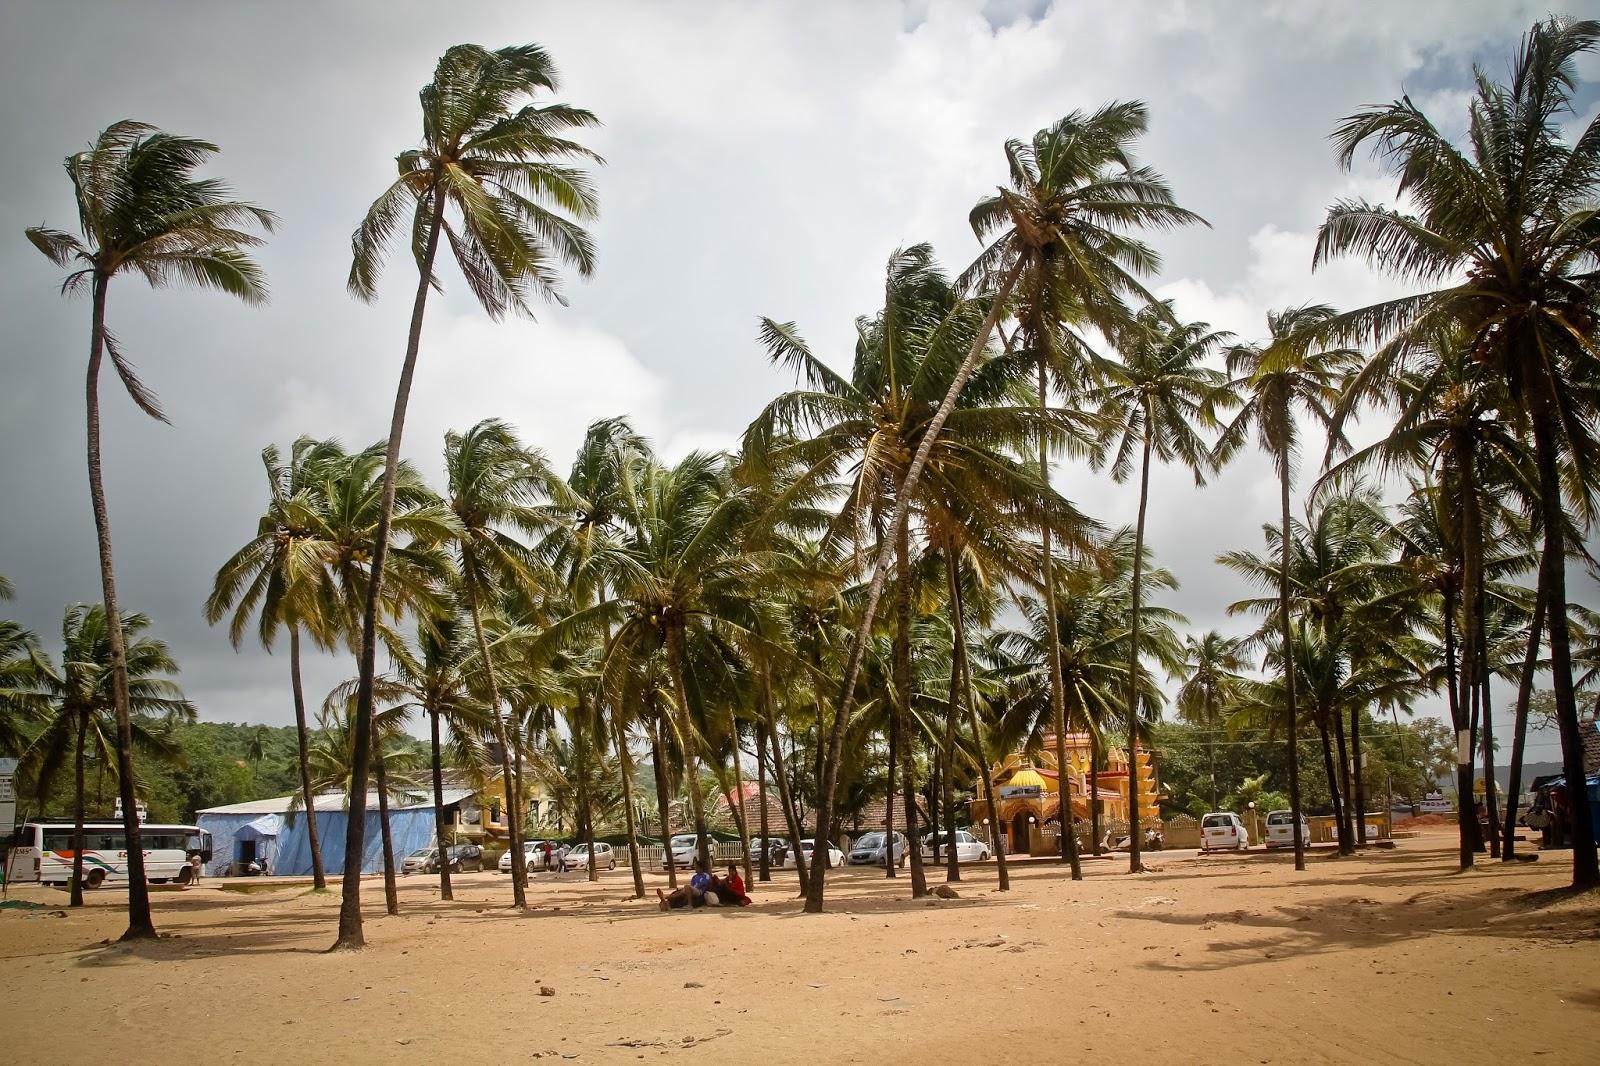 Бага, Индия отдых, пляжи, отели Баги от «Тонкостей туризма» 8